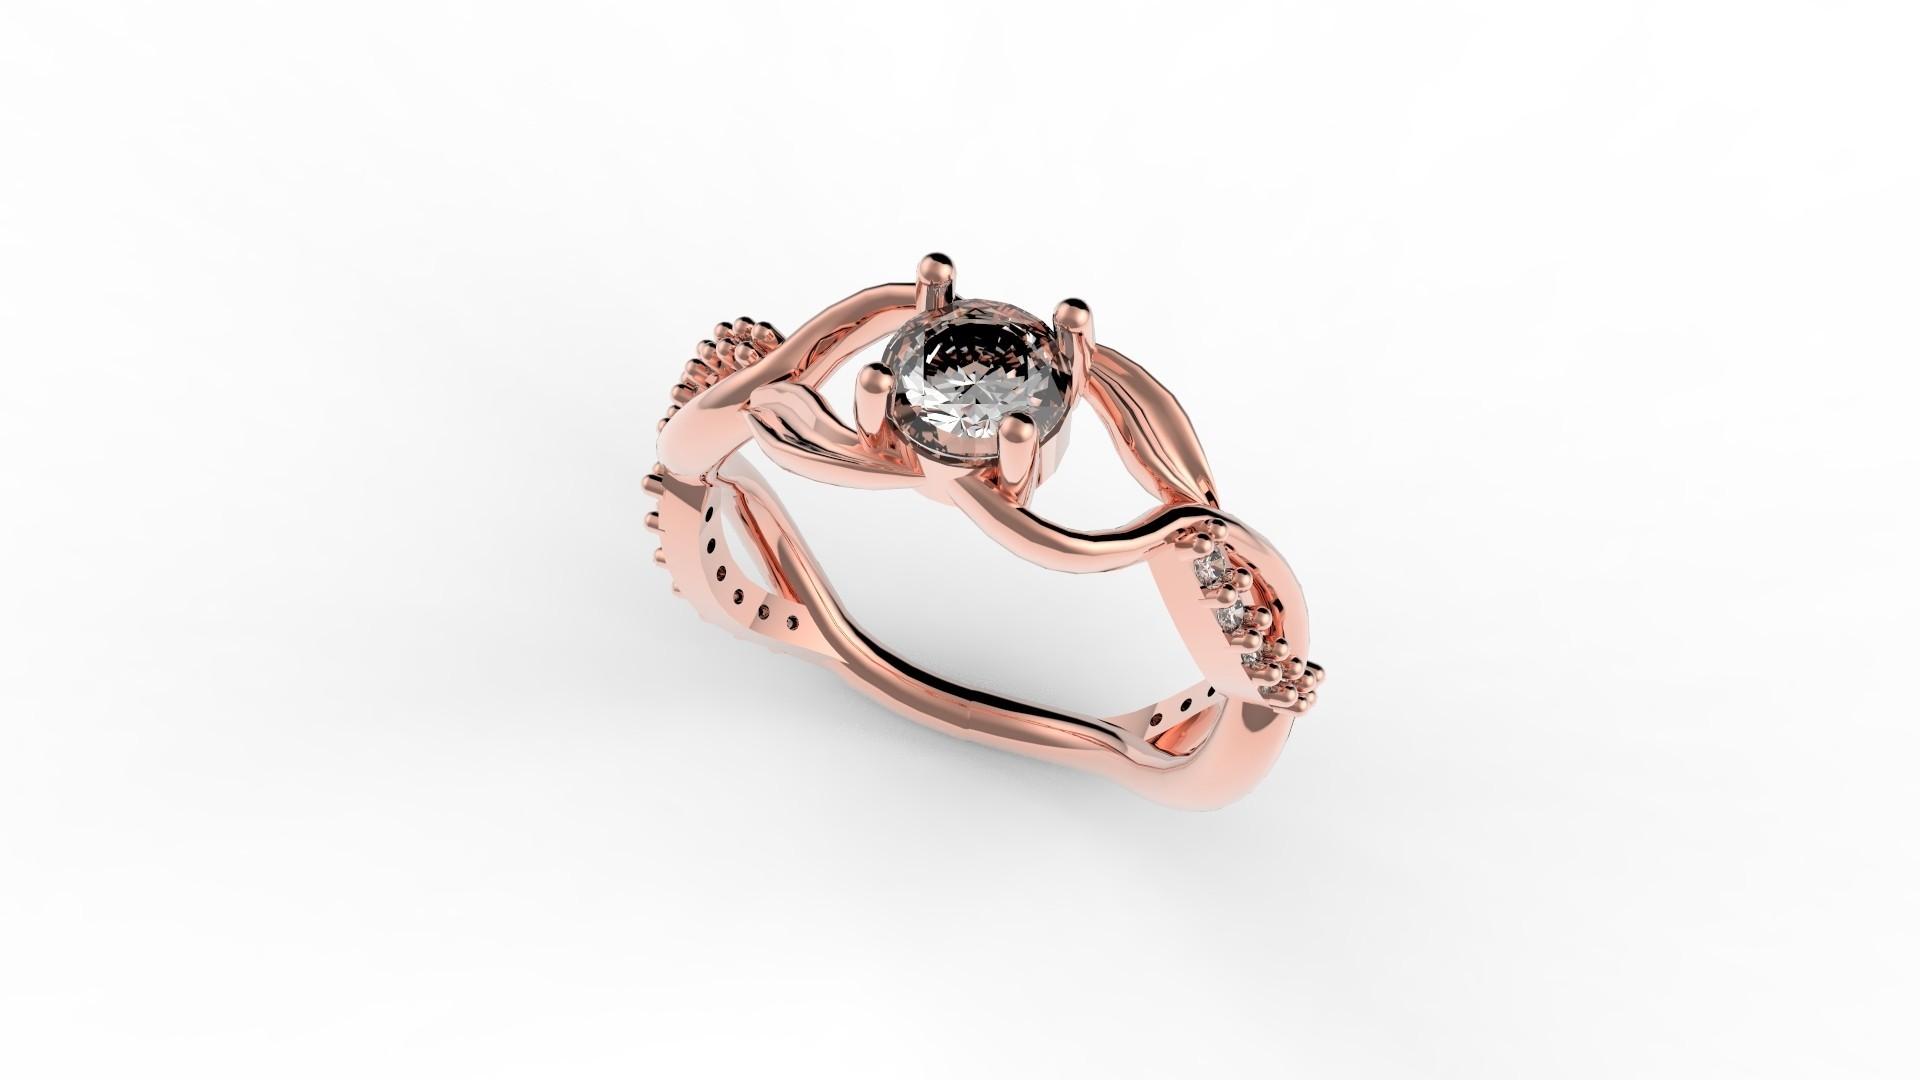 untitled.1338.jpg Download STL file DIAMOND RING • Model to 3D print, Dancad